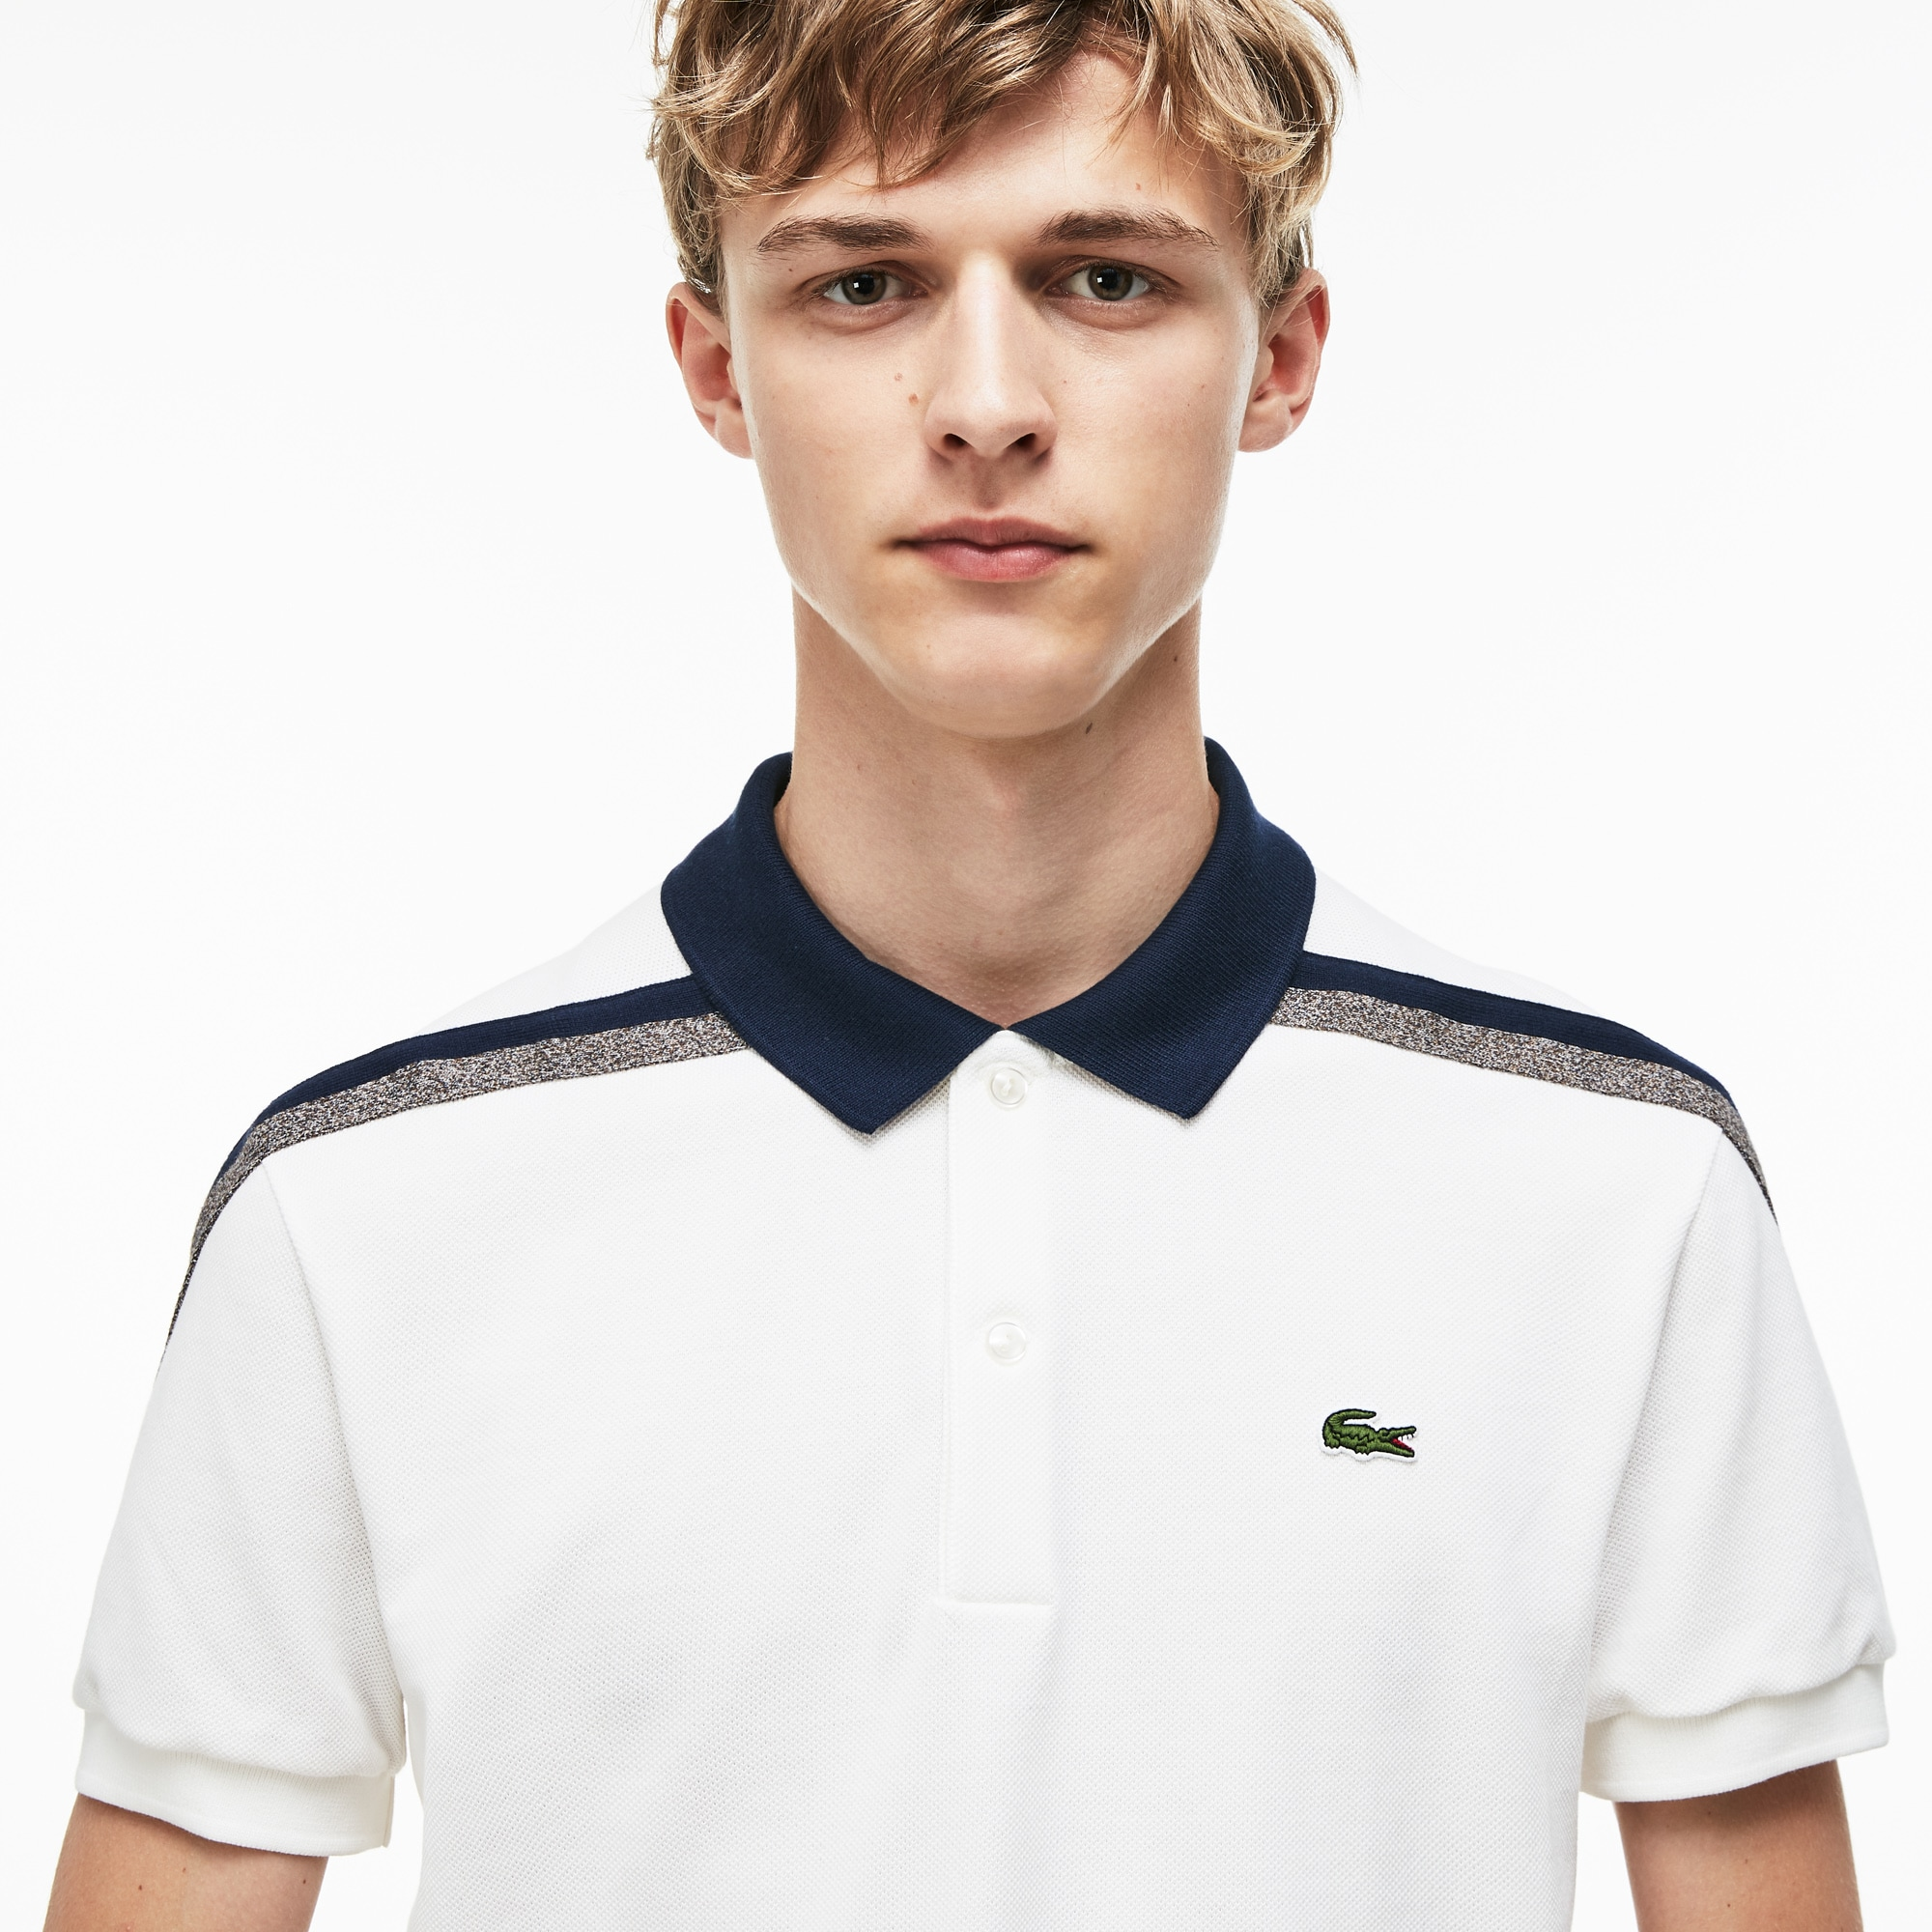 Lacoste Motion男士常规版棉质凸纹网眼面料Polo衫